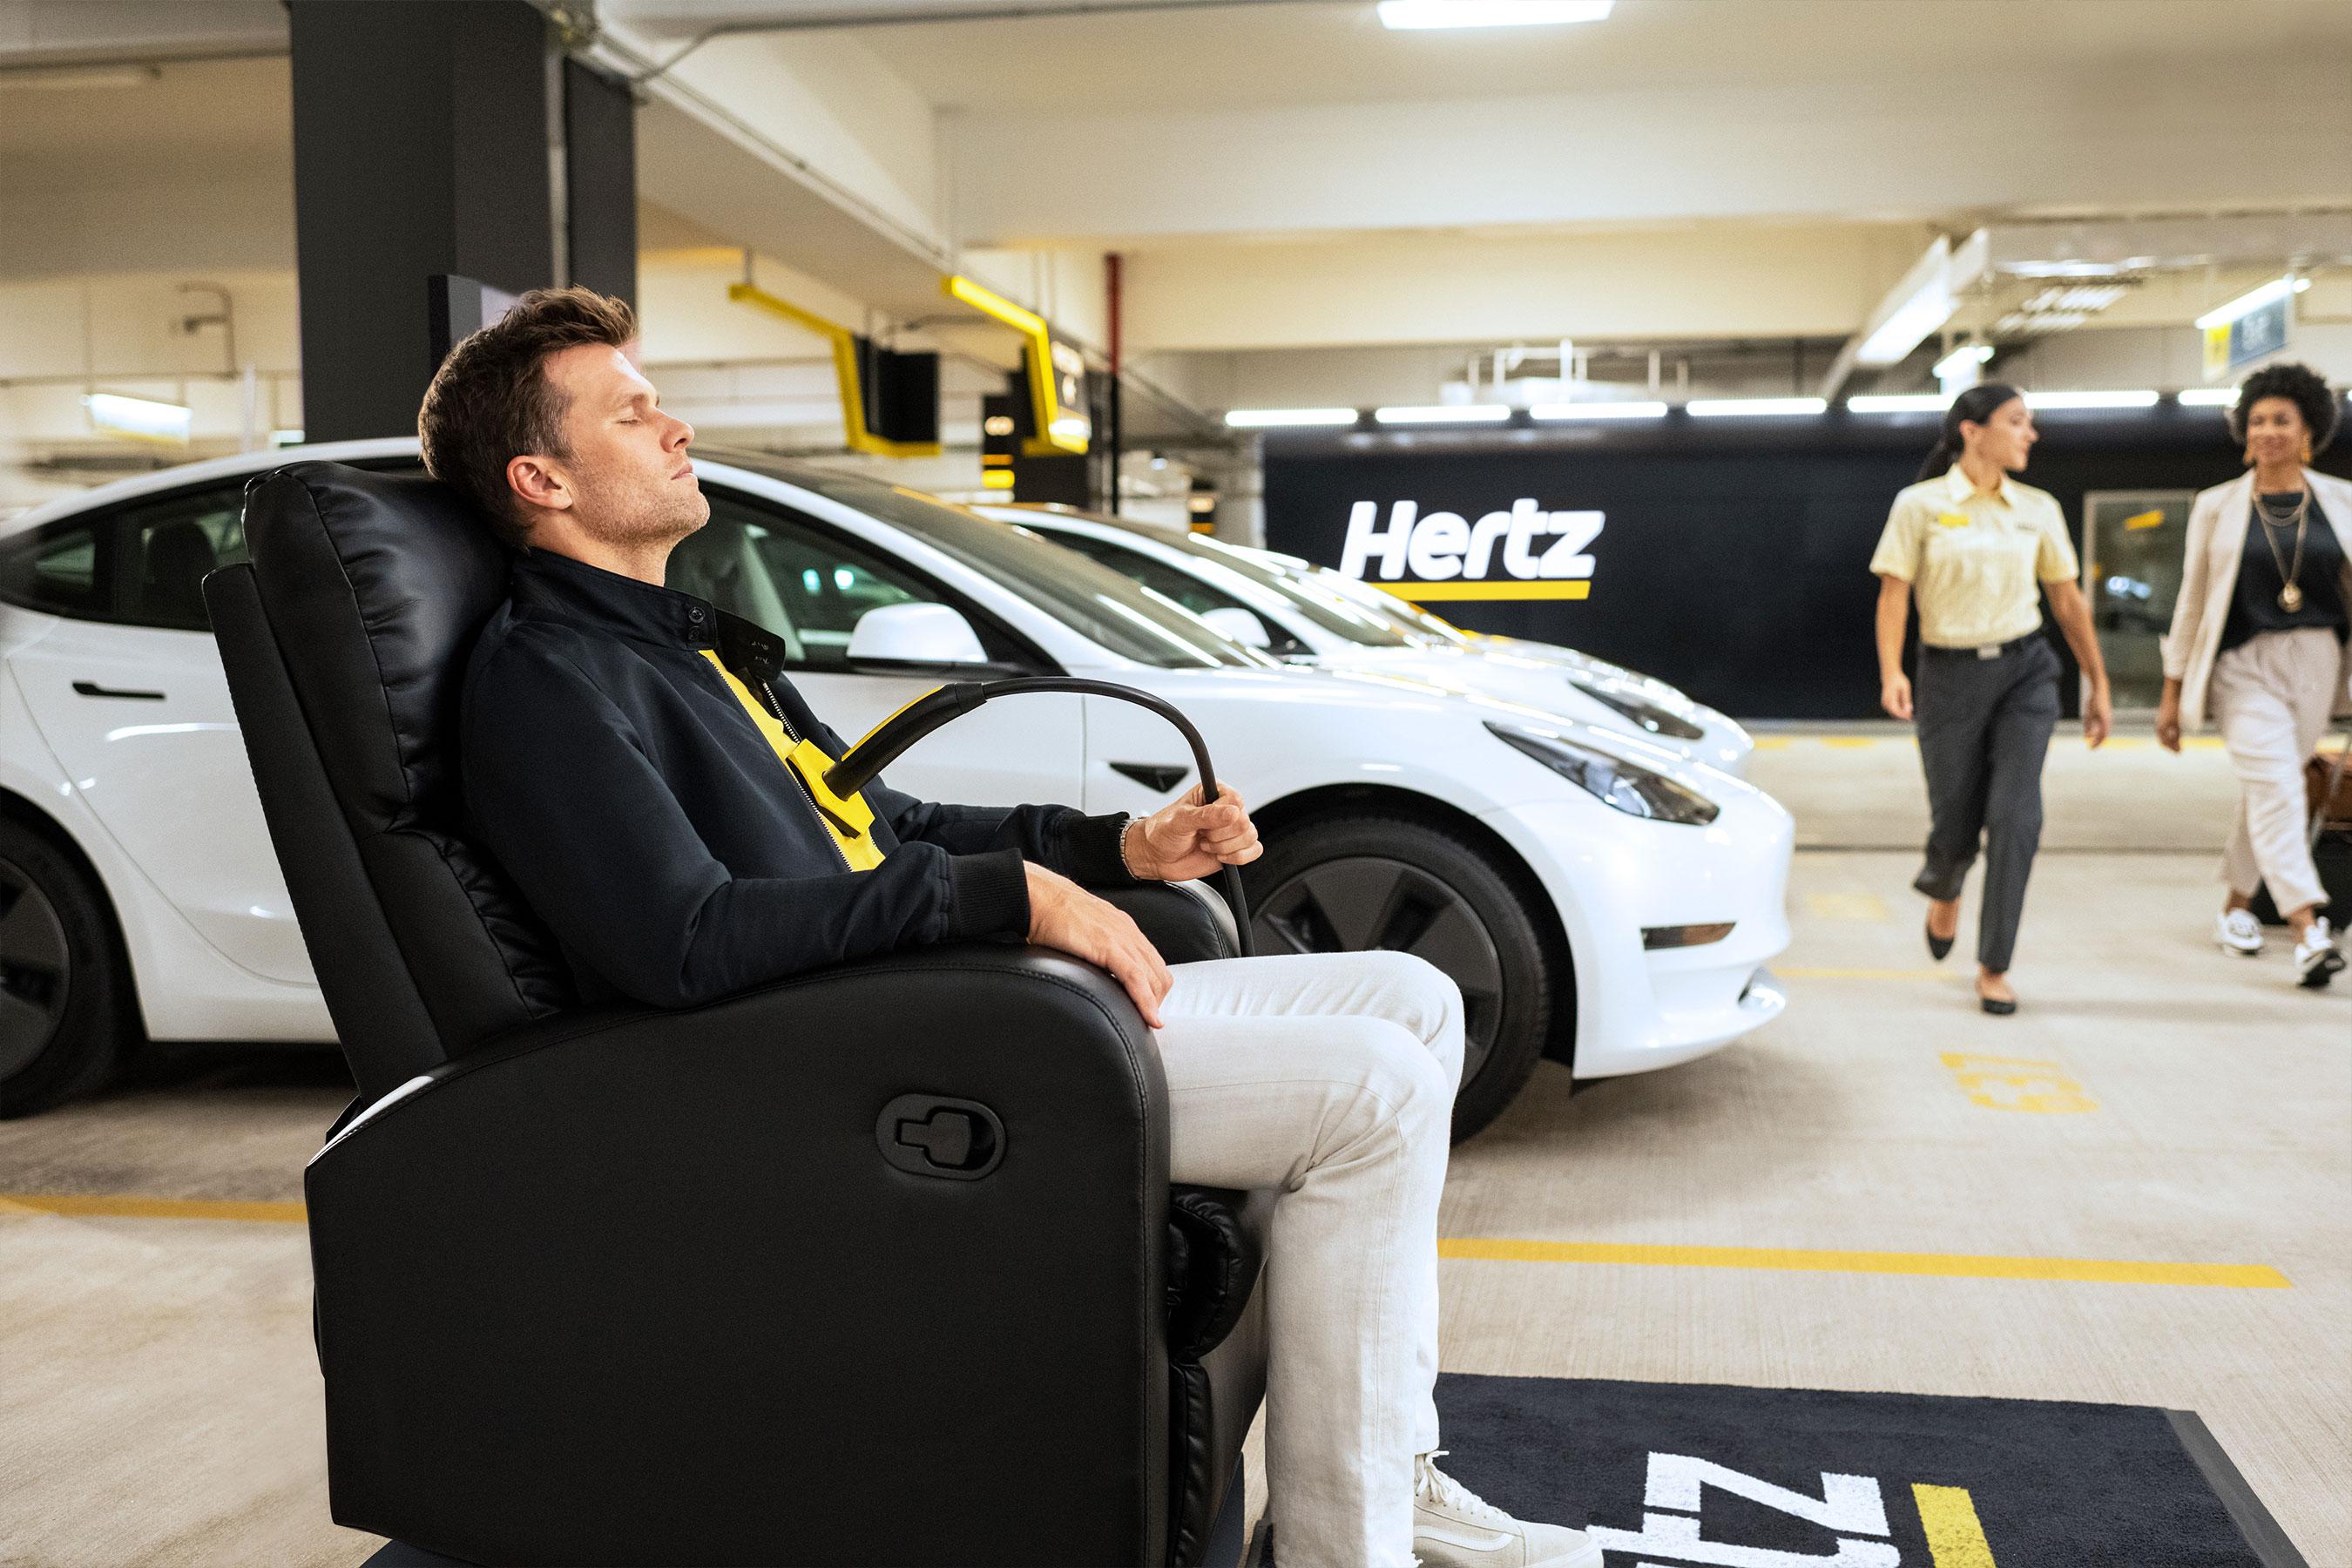 Behind the scenes at Hertz's